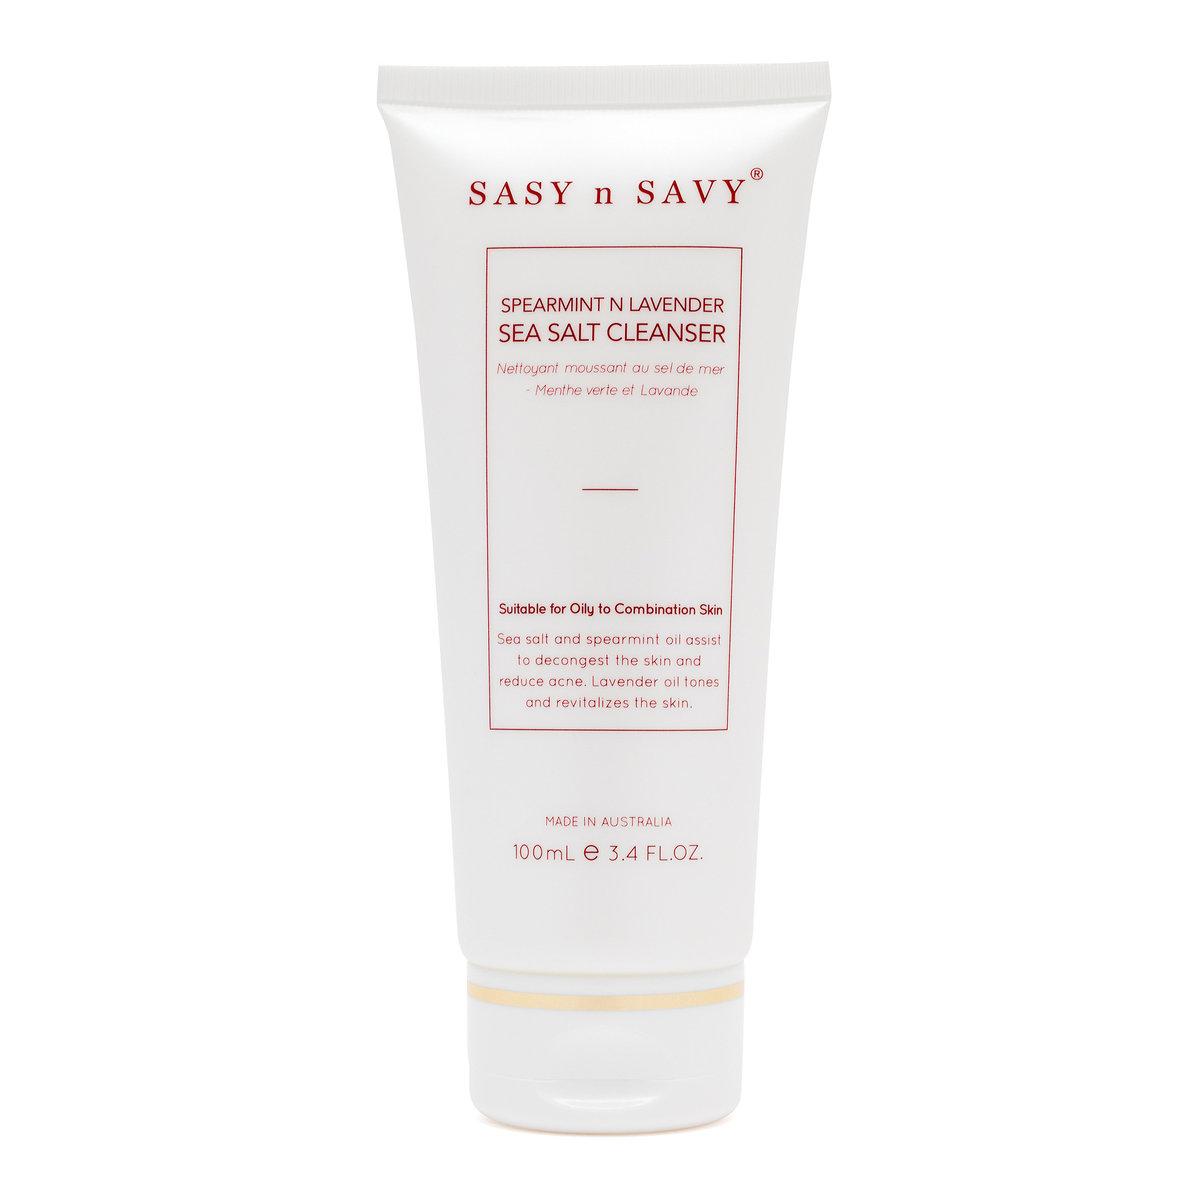 Spearmint n Lavender Sea Salt Foaming Cleanser-Organic & Natural Skincare